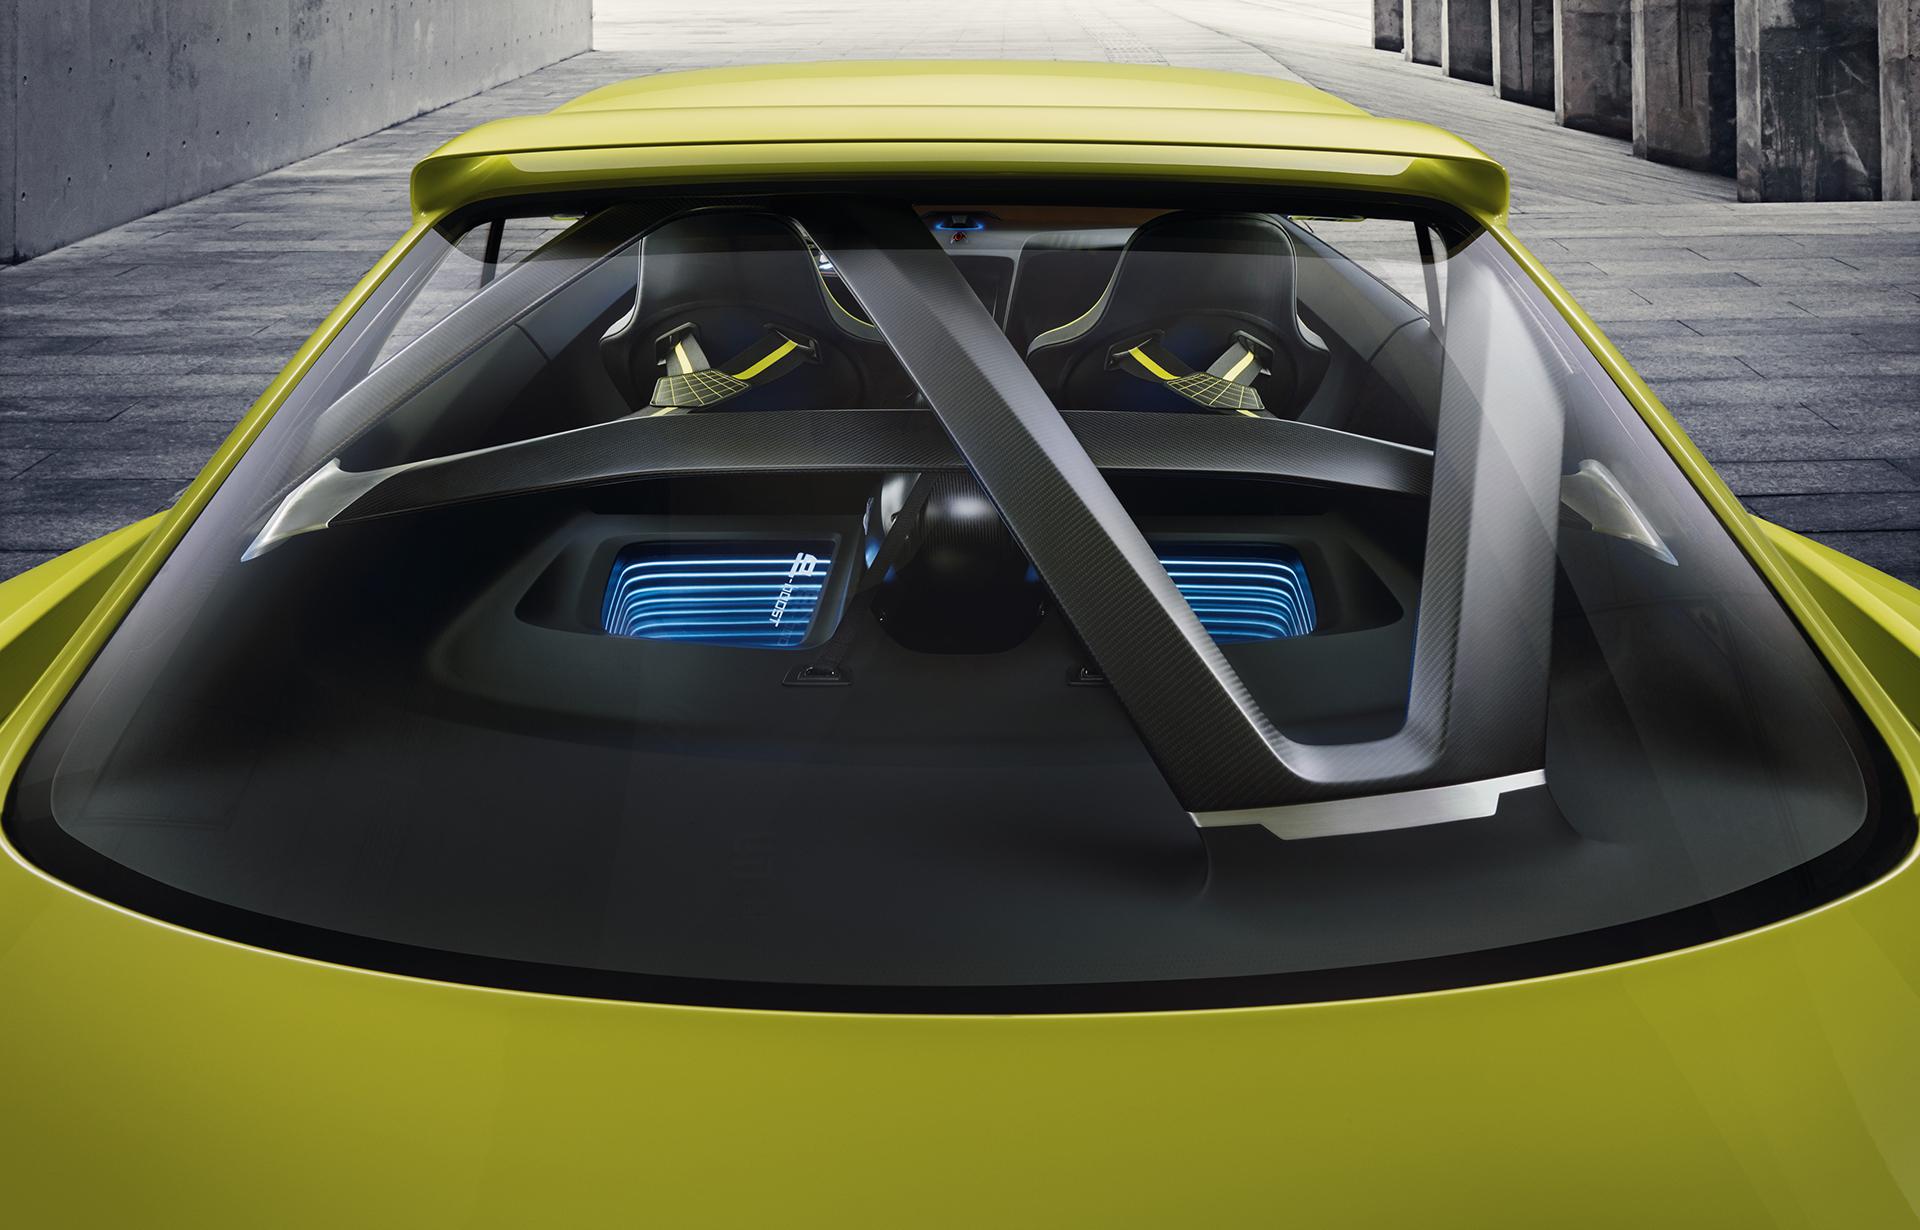 BMW 3.0 CSL Hommage - external rear top / arrière haut